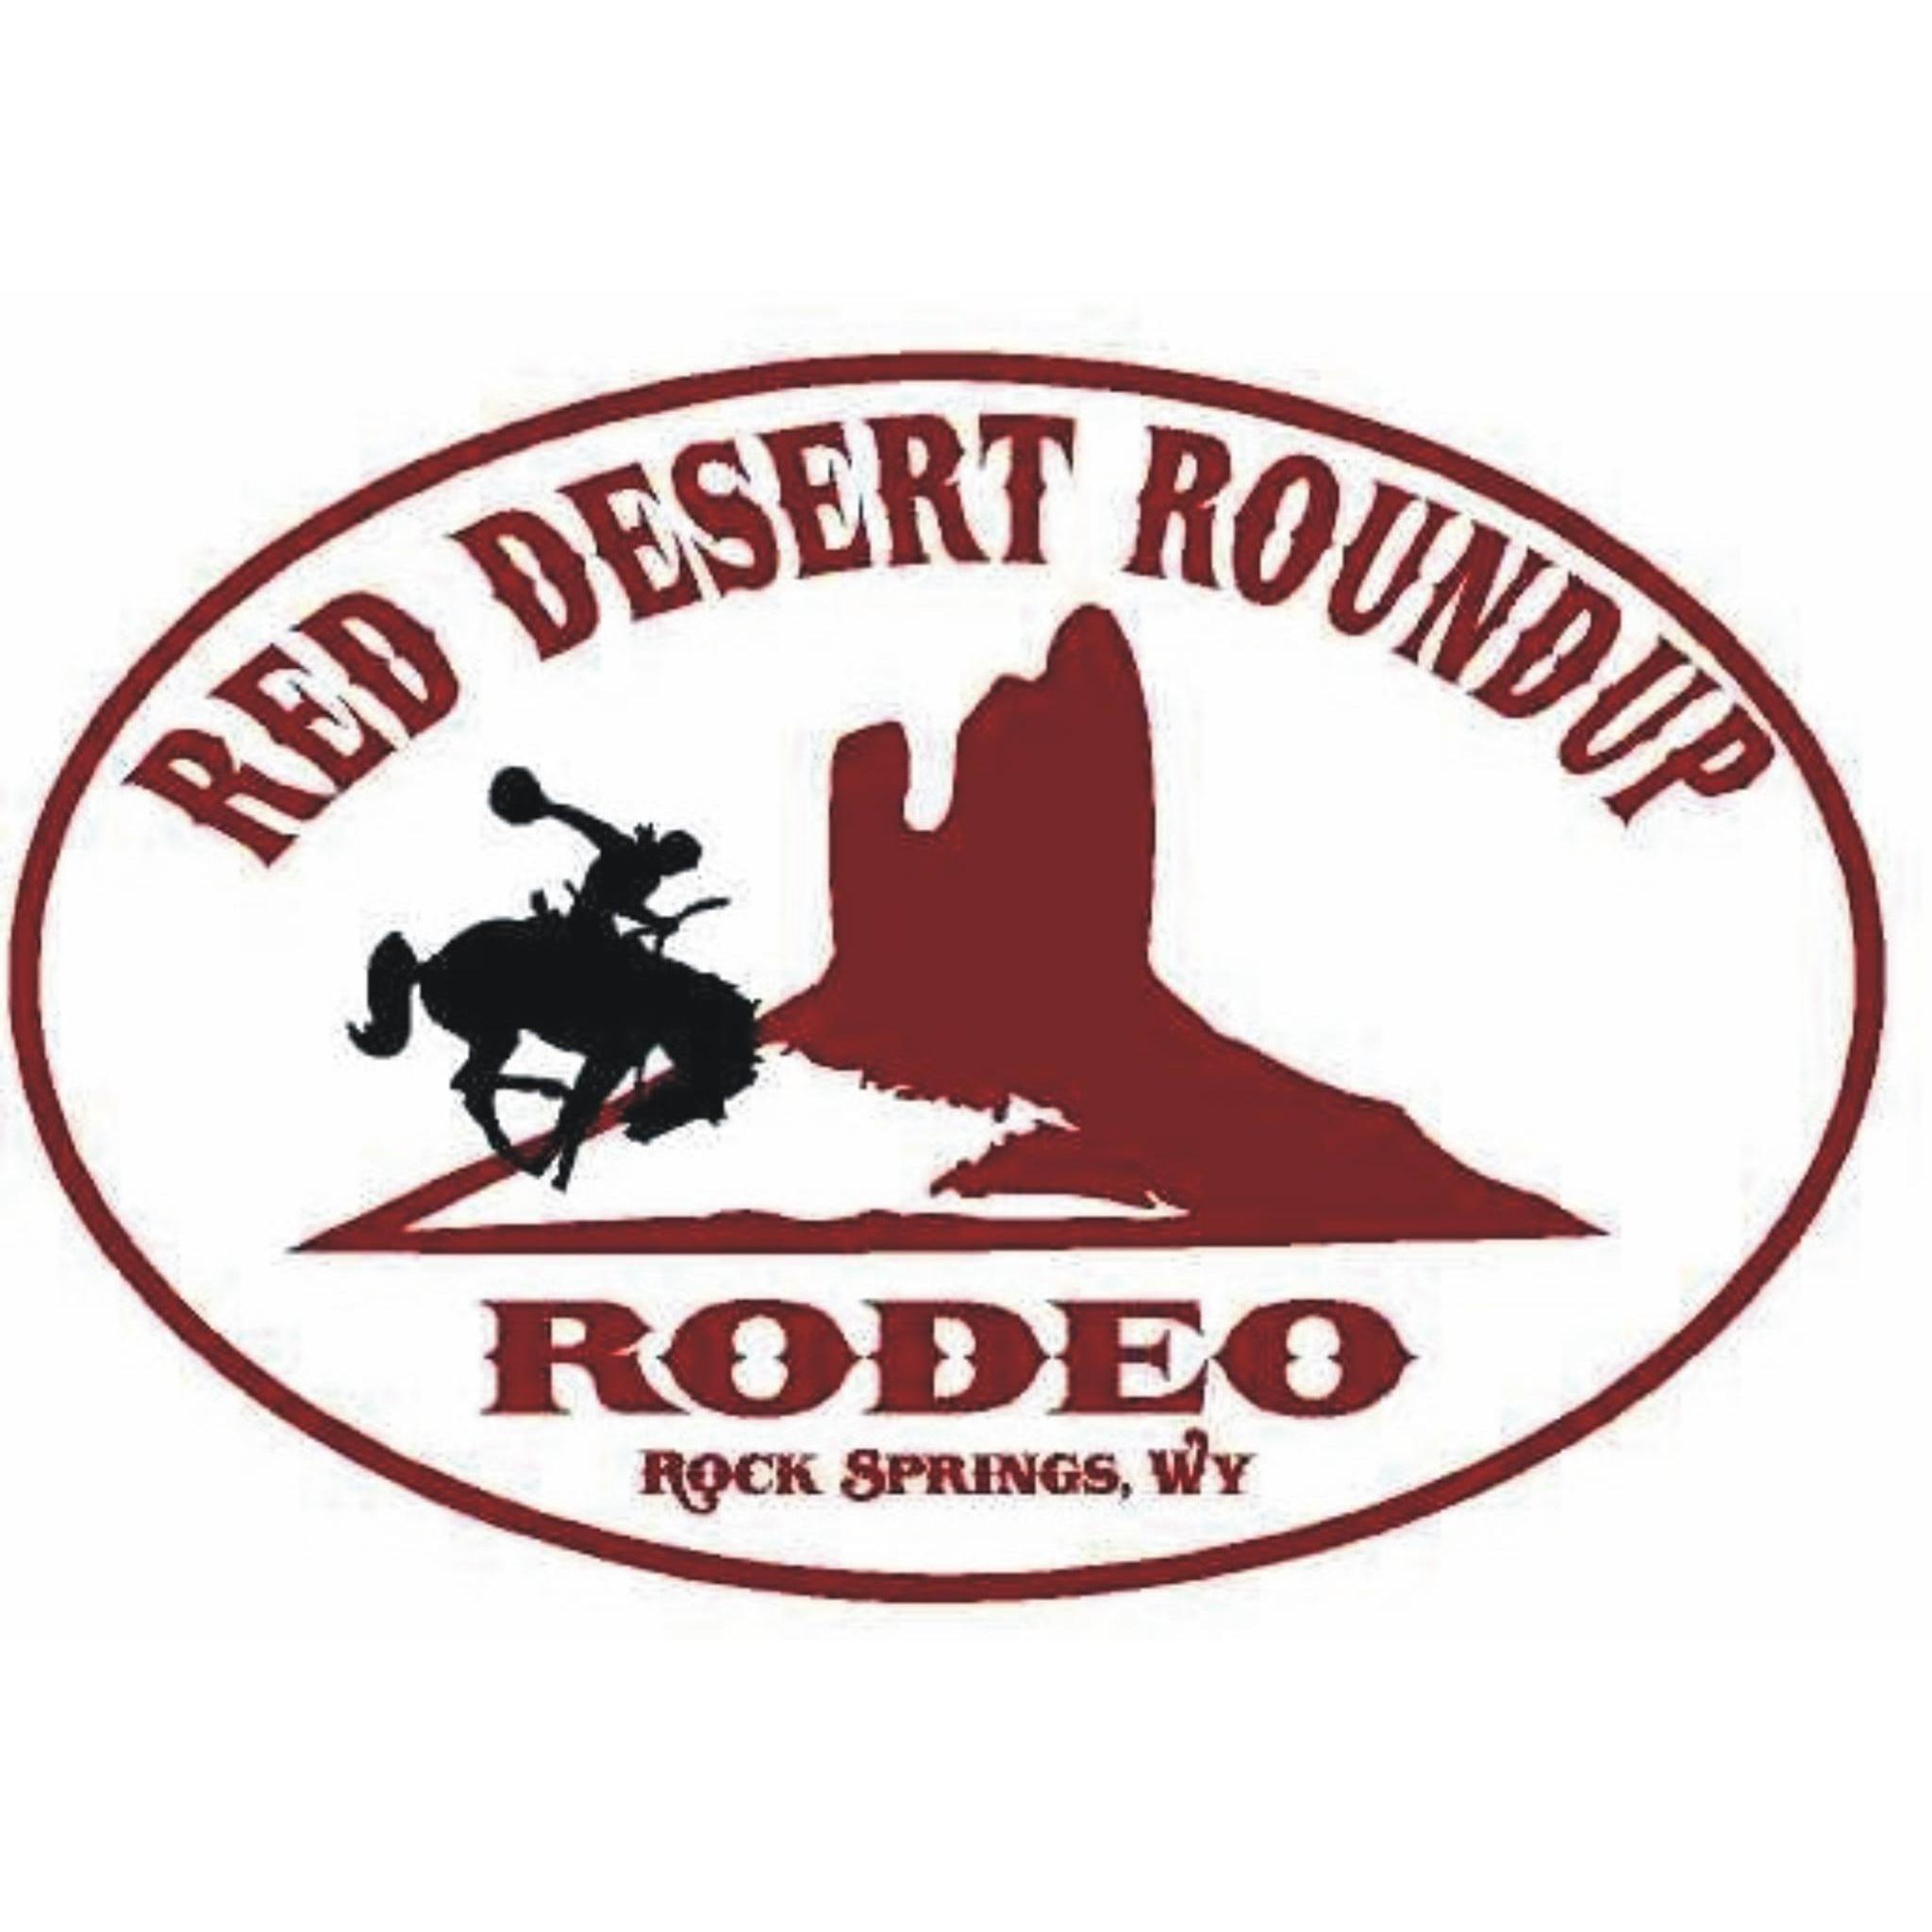 Red Desert Roundup Rodeo image 14